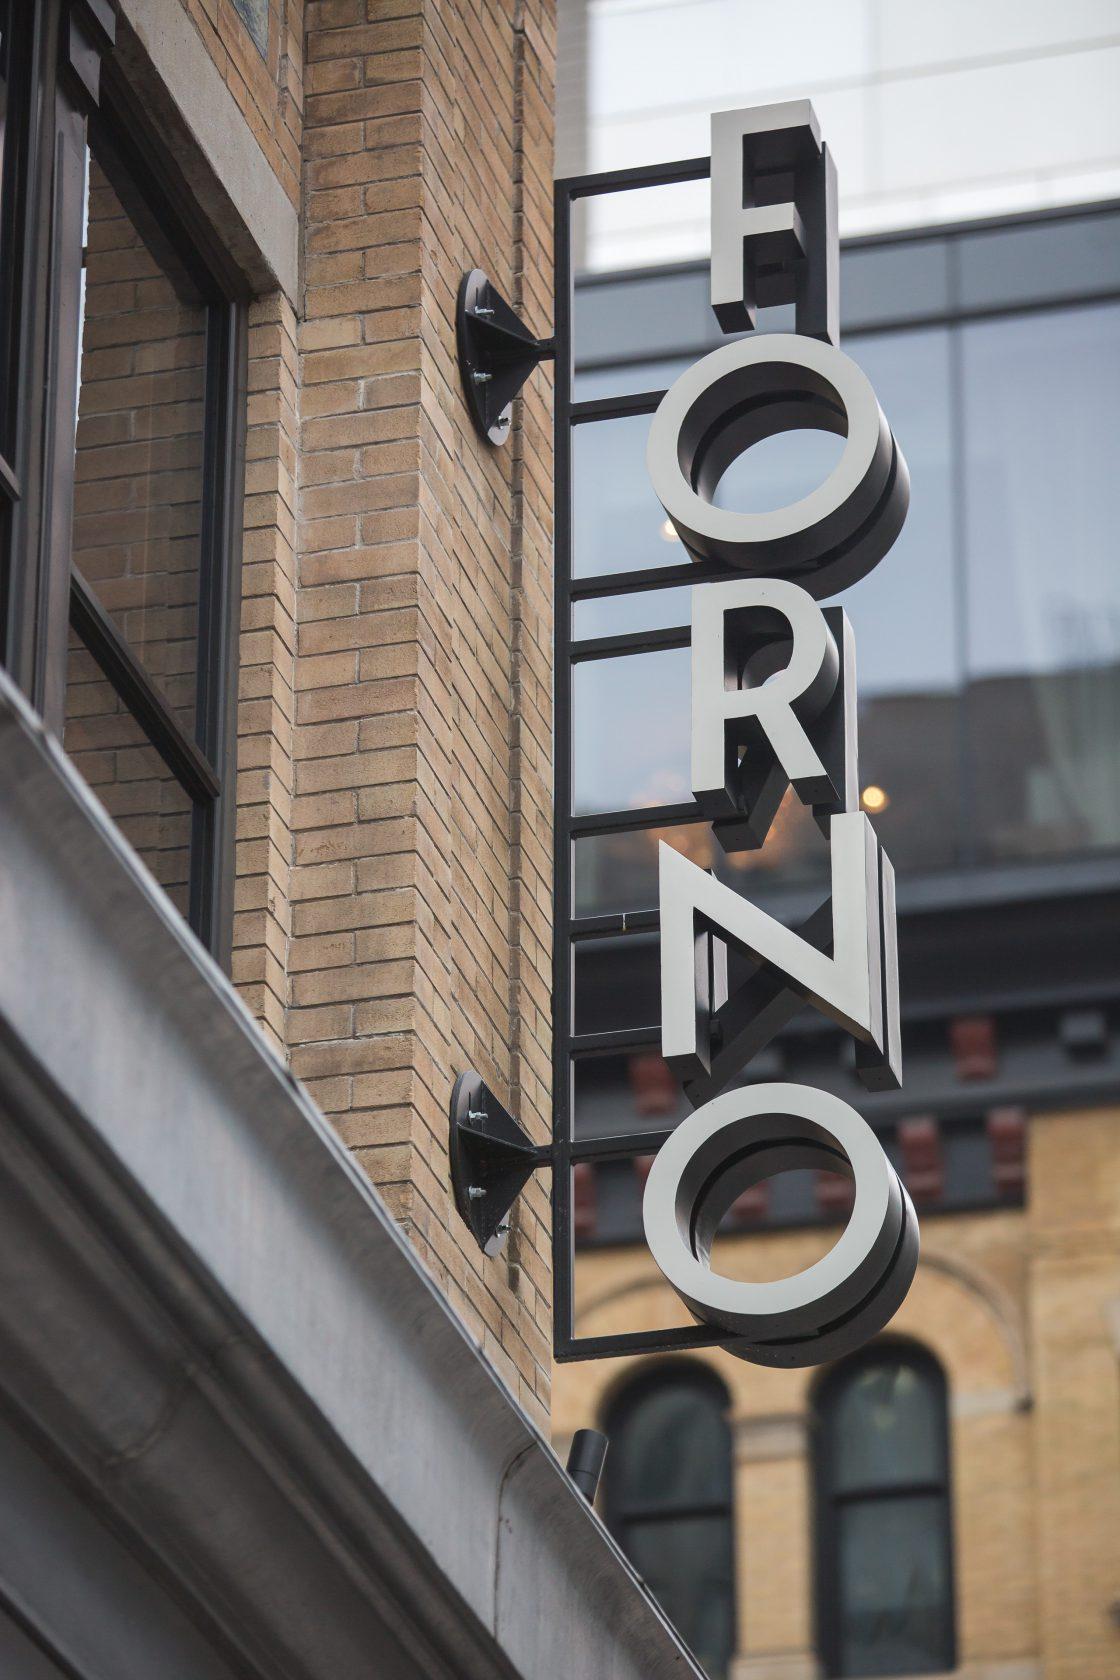 The Livmore Neighbourhood - Forno Cultra (Cafe & Bakery)